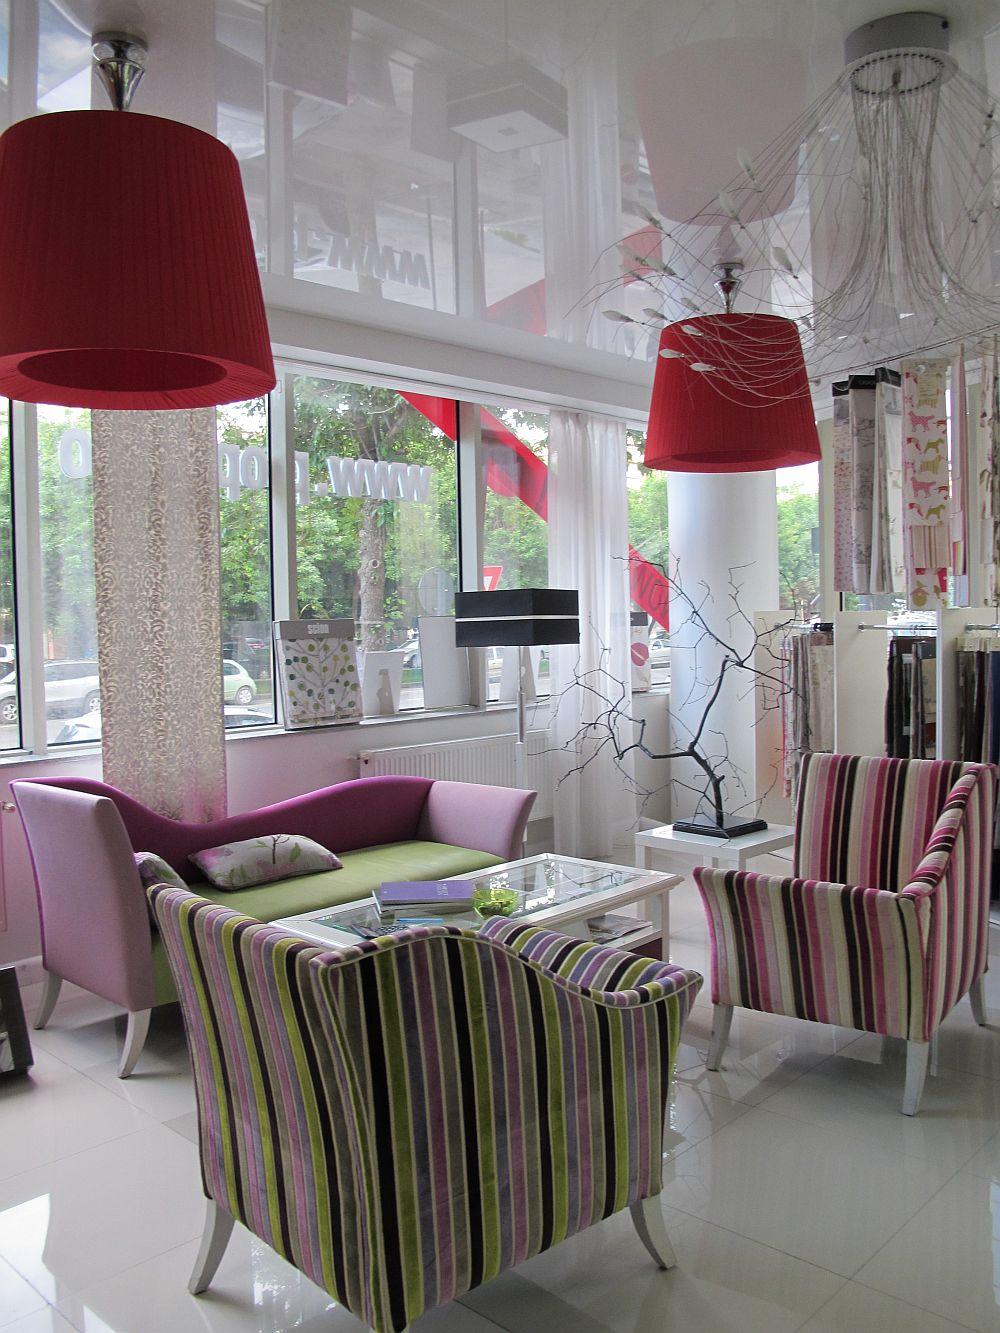 adelaparvu.com despre decoratiuni ProPlus, tapete, perdele, draperii, corpuri iluminat, oglinzi, mobila, parchet (1)